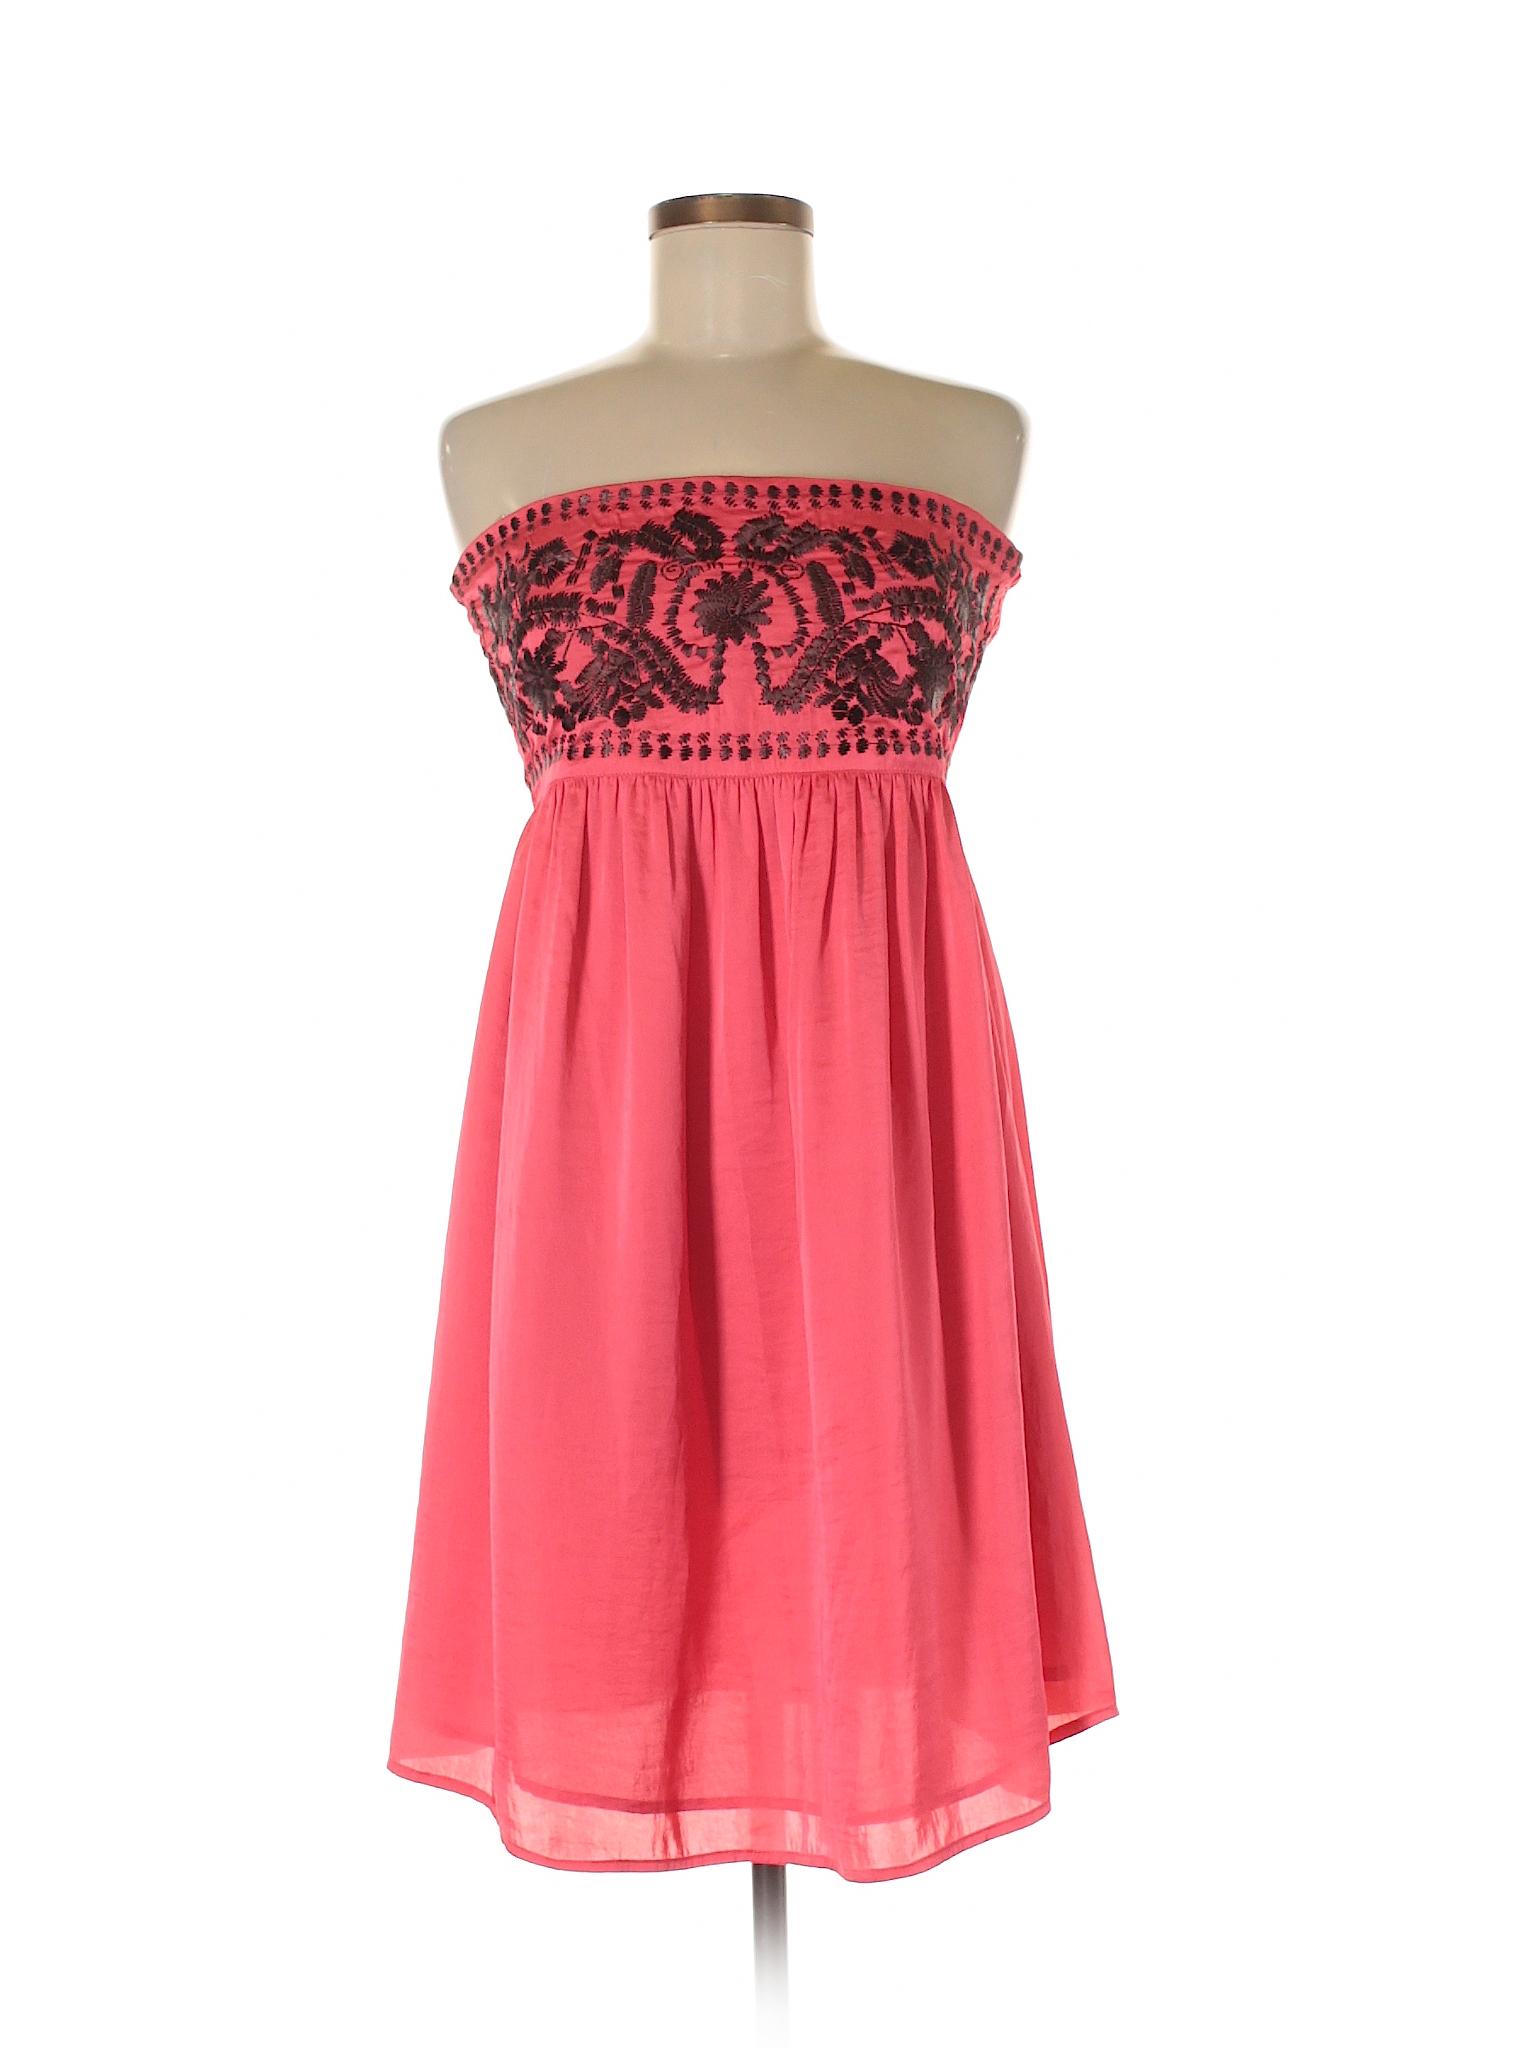 Casual winter Boutique Theme Dress Boutique winter zIq8w